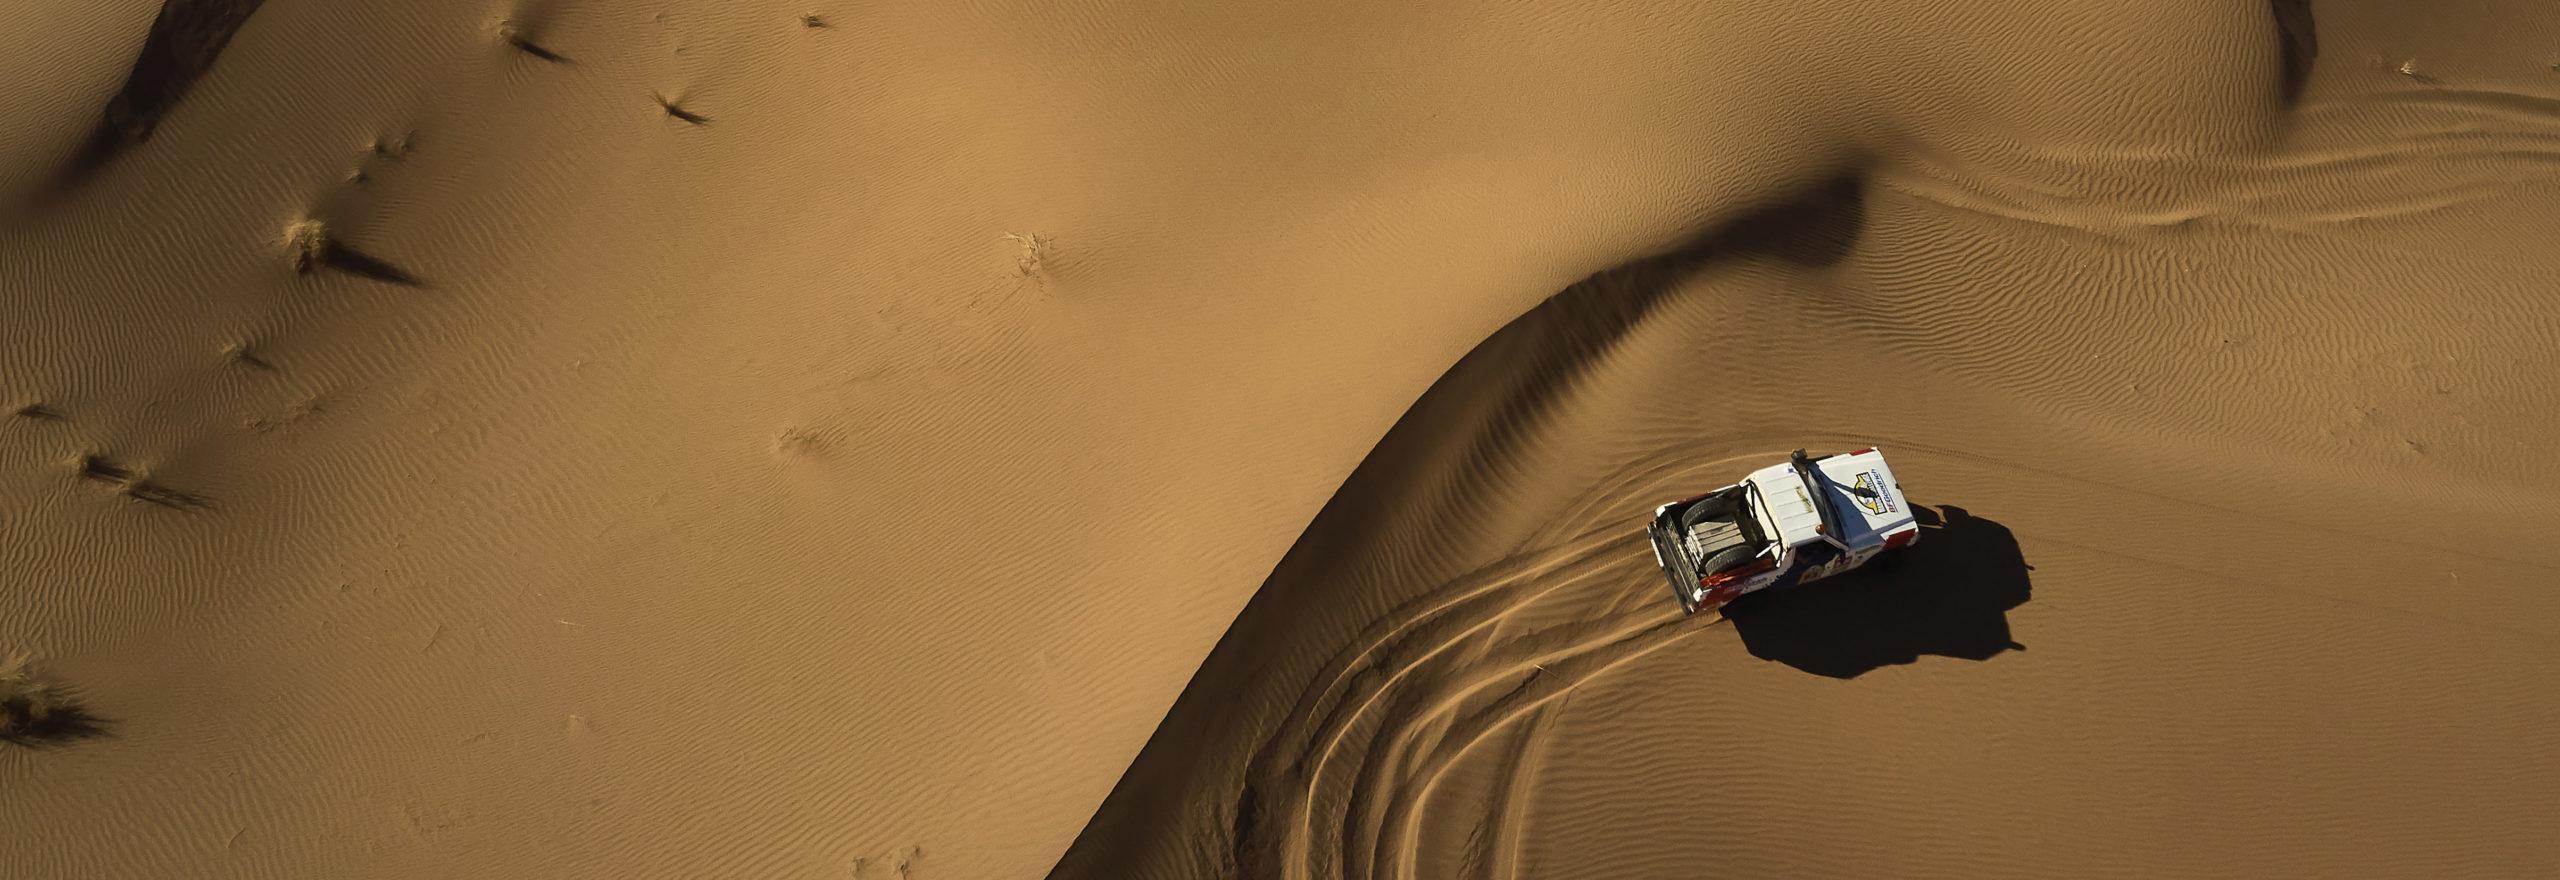 Get Lost   Sel Drive Adventures   Marruecos